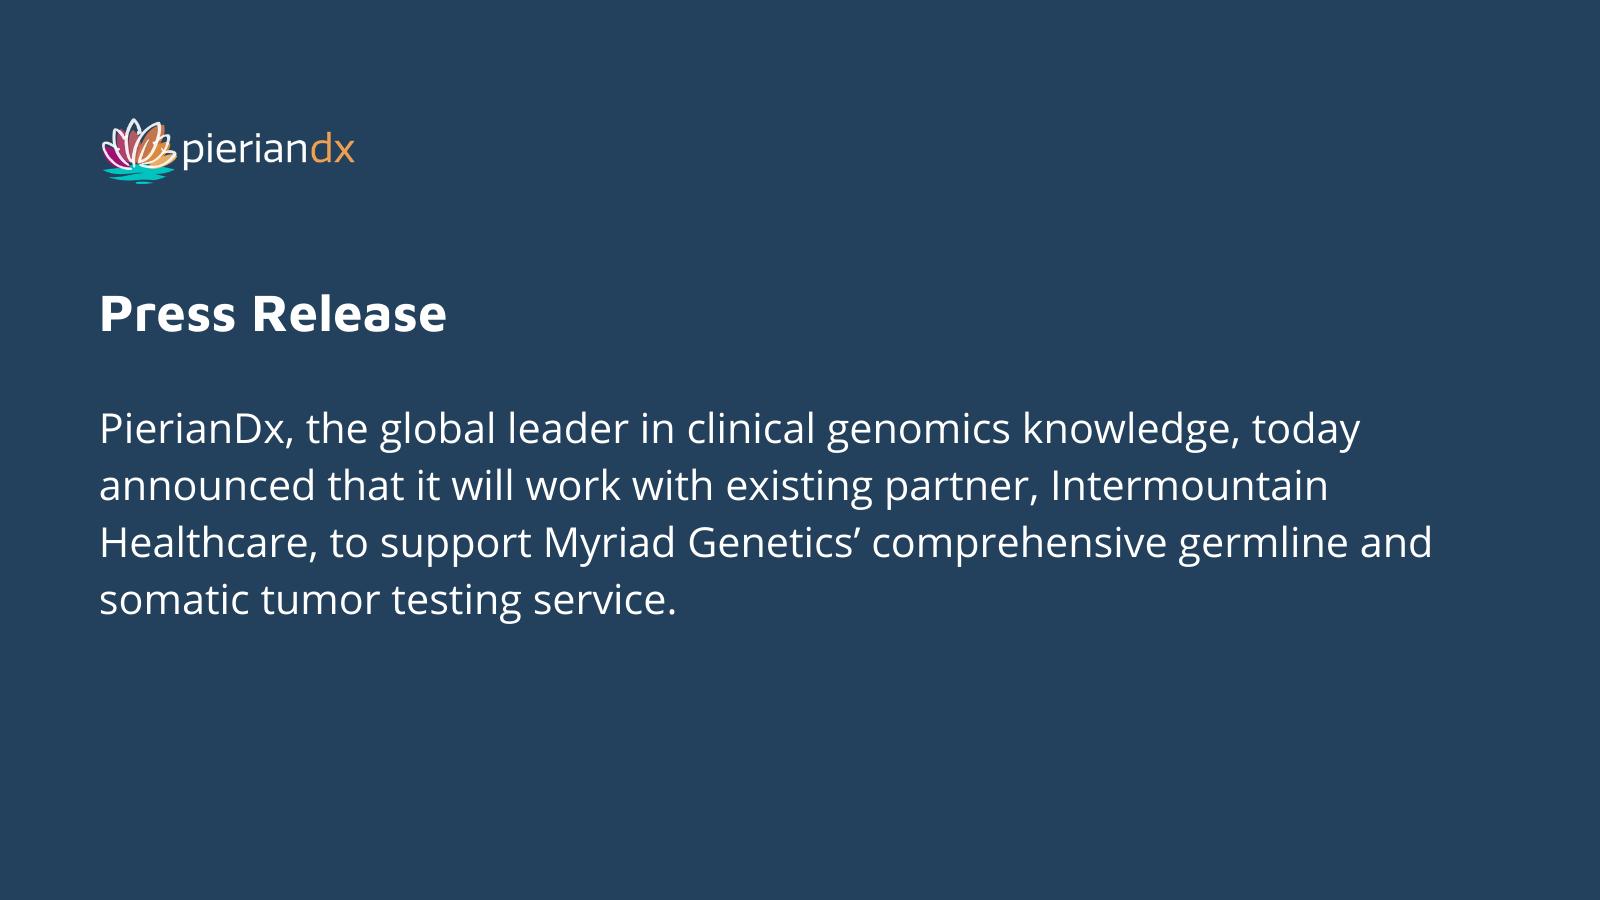 PierianDx and Intermountain Healthcare Combine Expertise to Advance Myriad Genetics' Tumor Test Offering